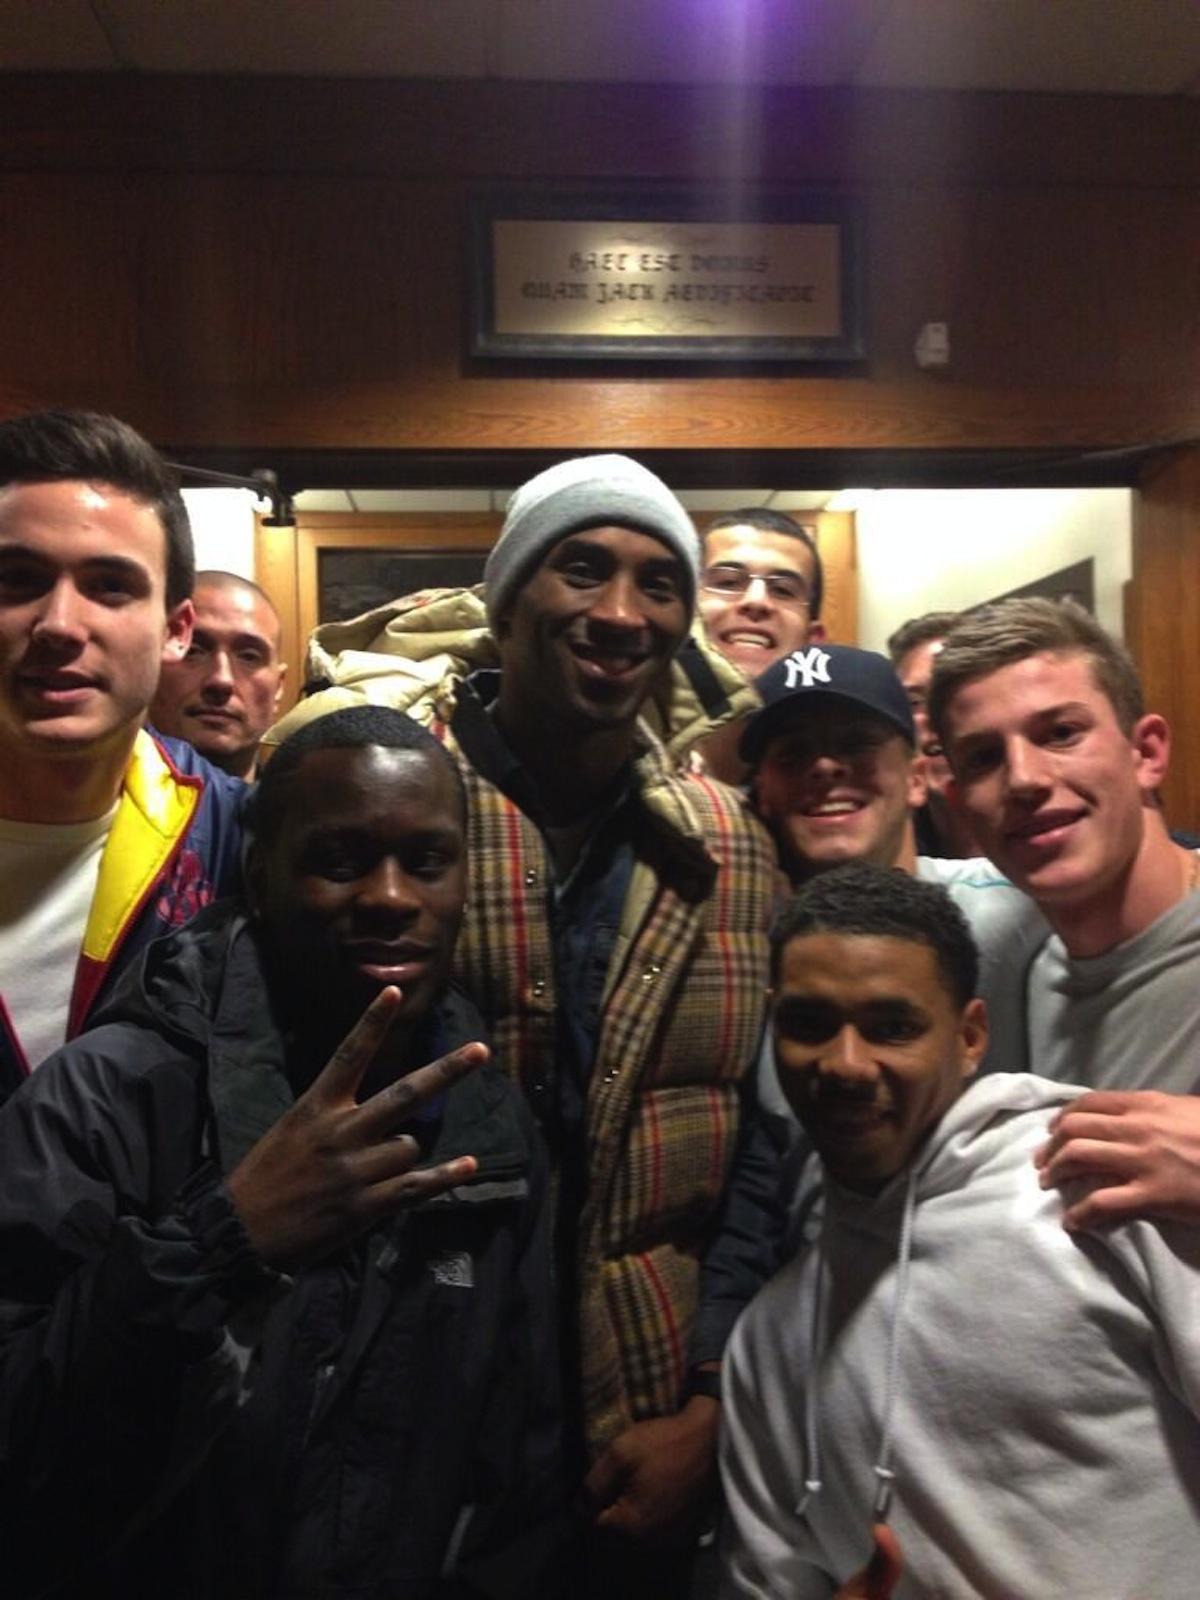 Kobe Bryant Photo Via Josh Reed On Twitter